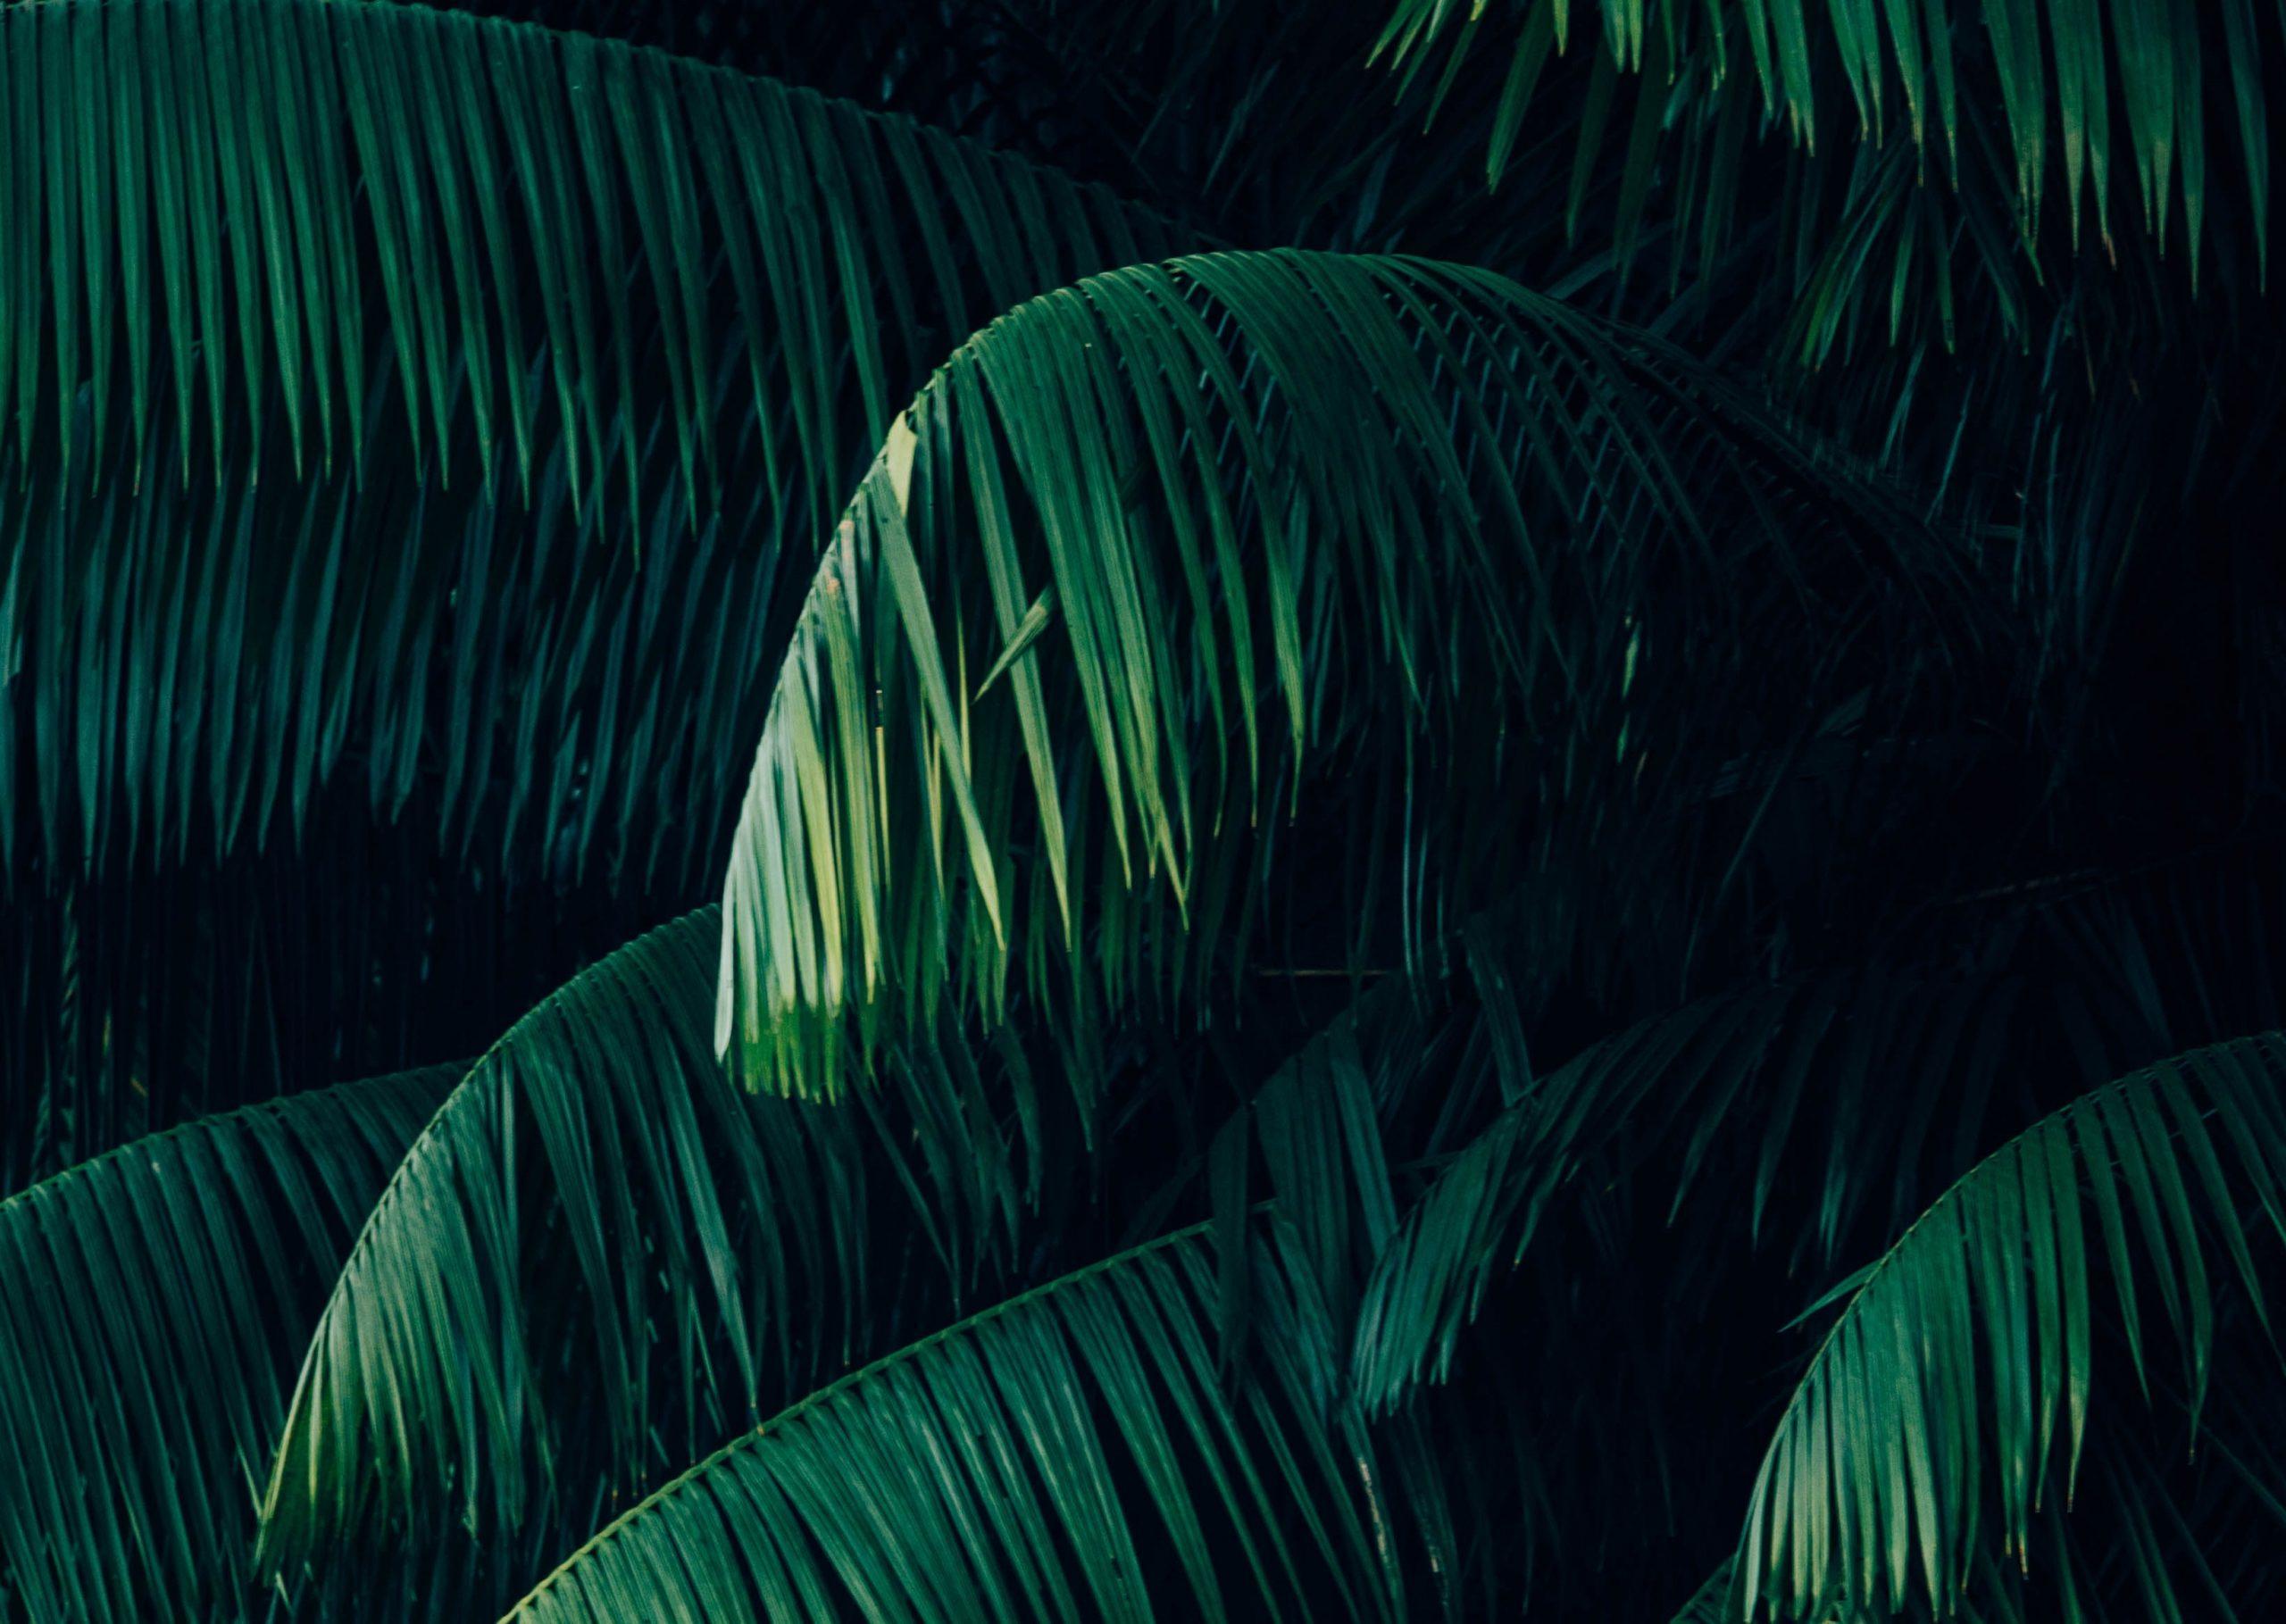 Latin Amerika növény dzsungel